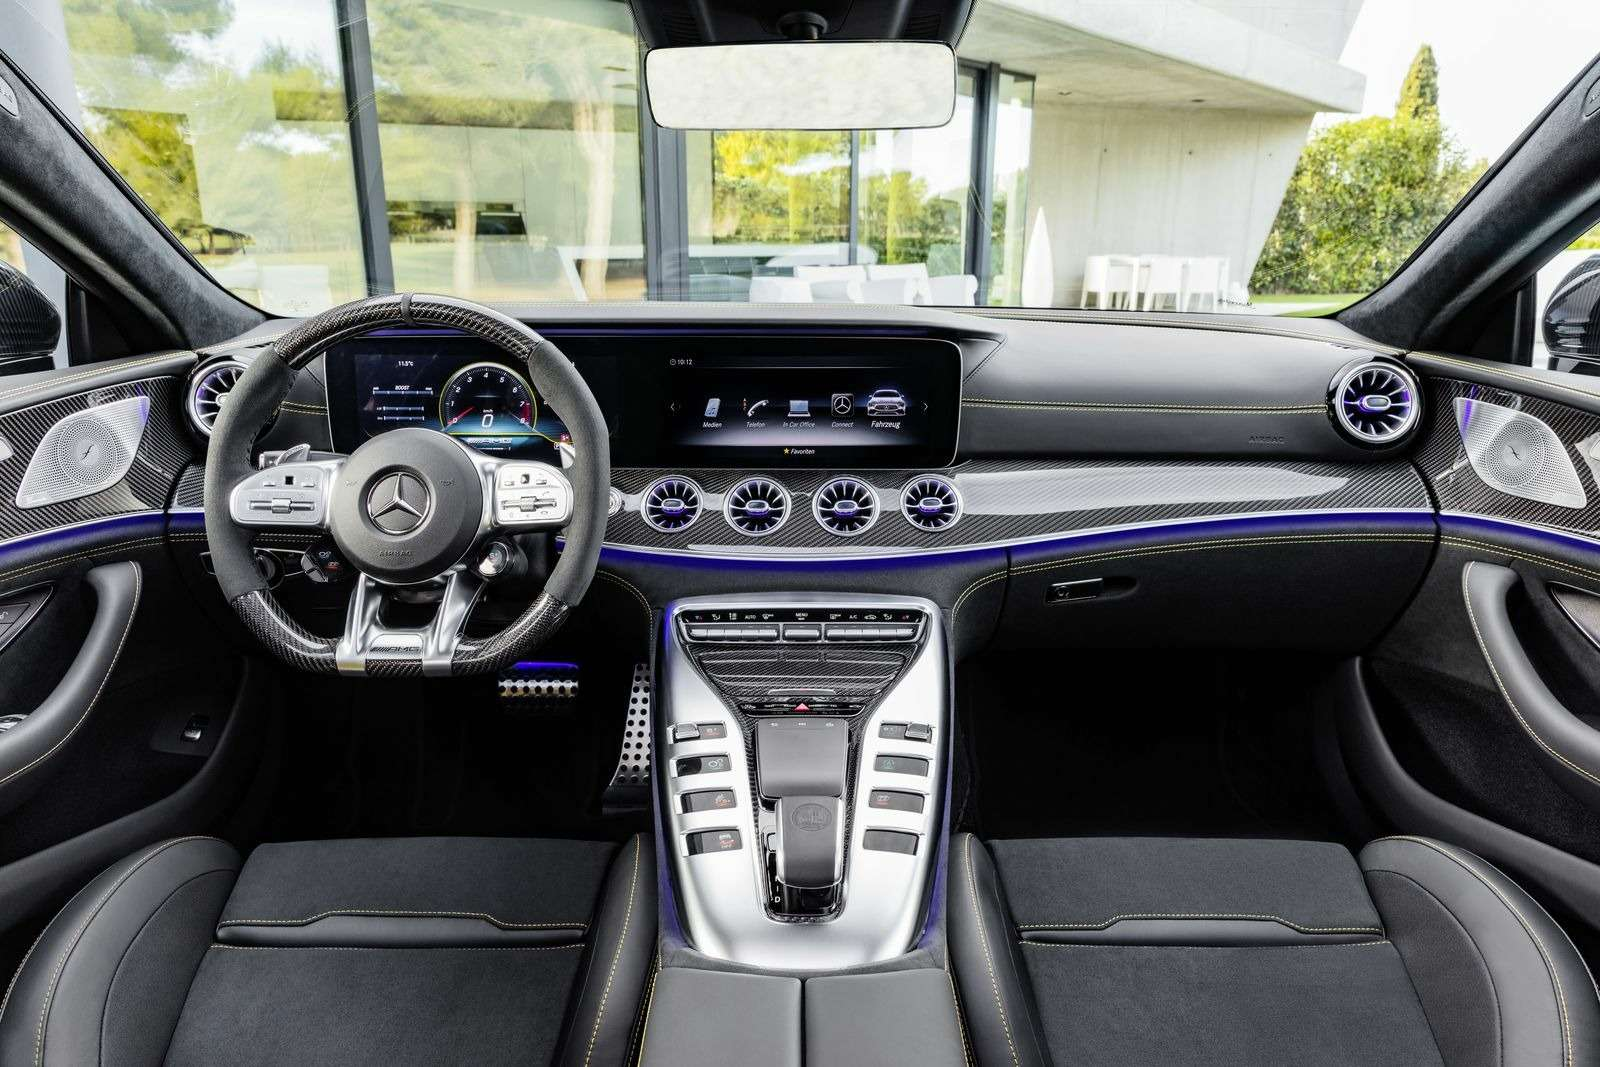 Подмена! Пятидверный Mercedes-AMG GTполучил «тележку» Е-класса— фото 851523